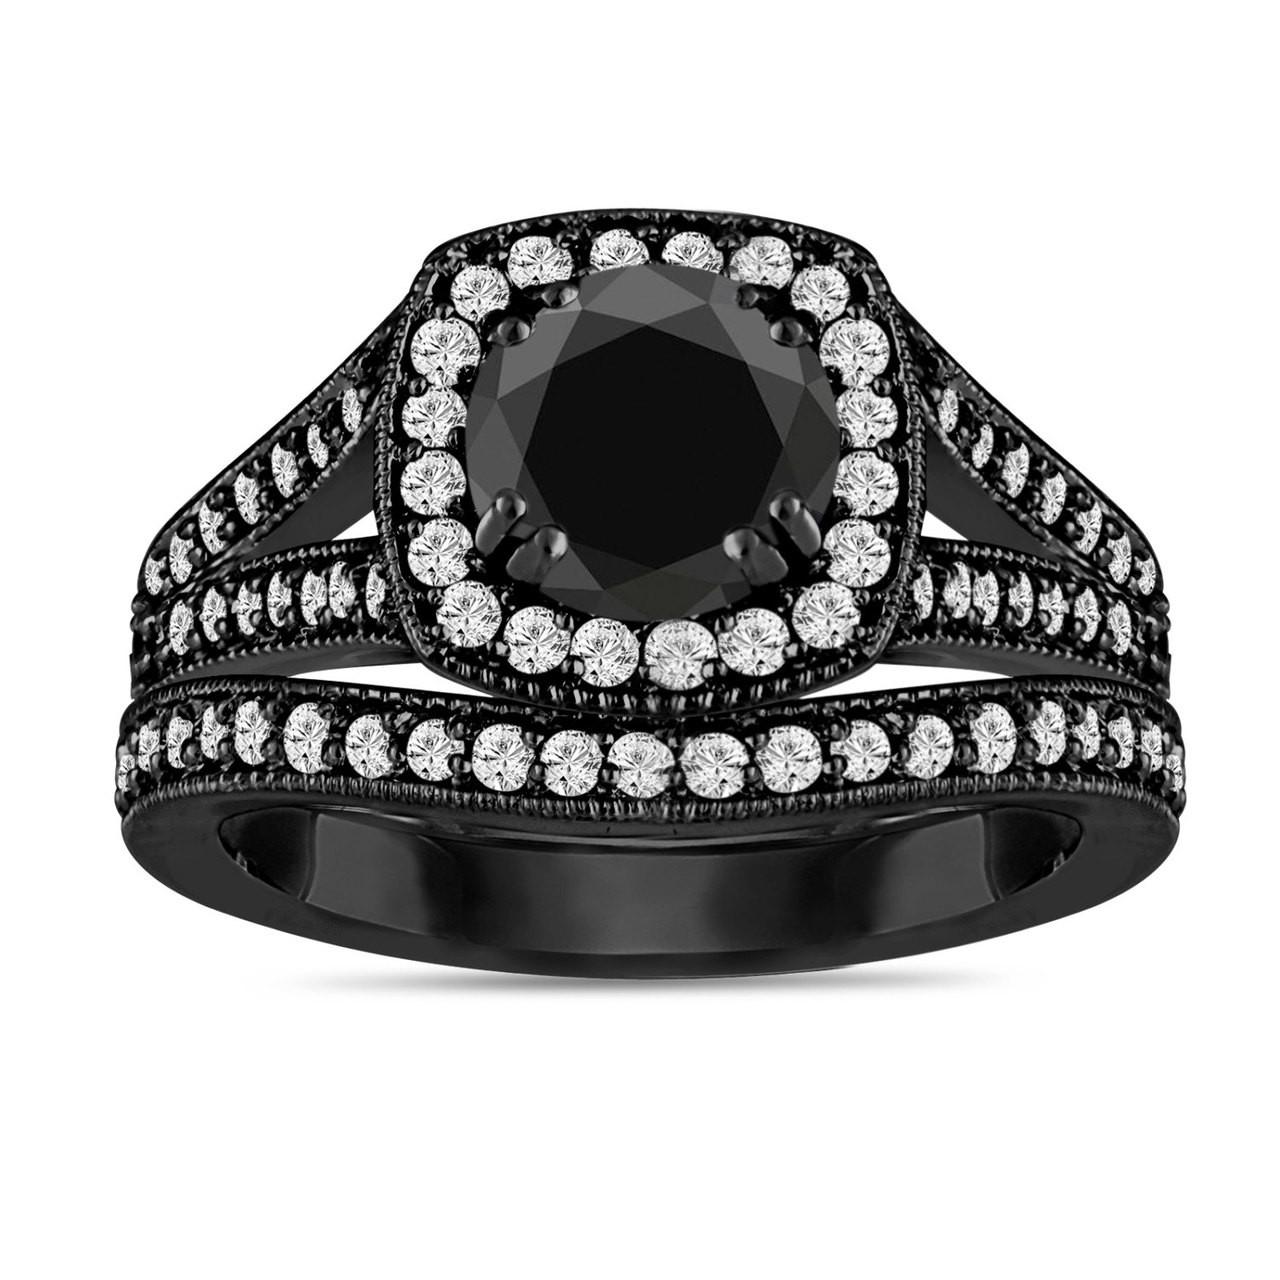 Black Diamond Engagement Ring Set Vintage Wedding Rings Sets 14k